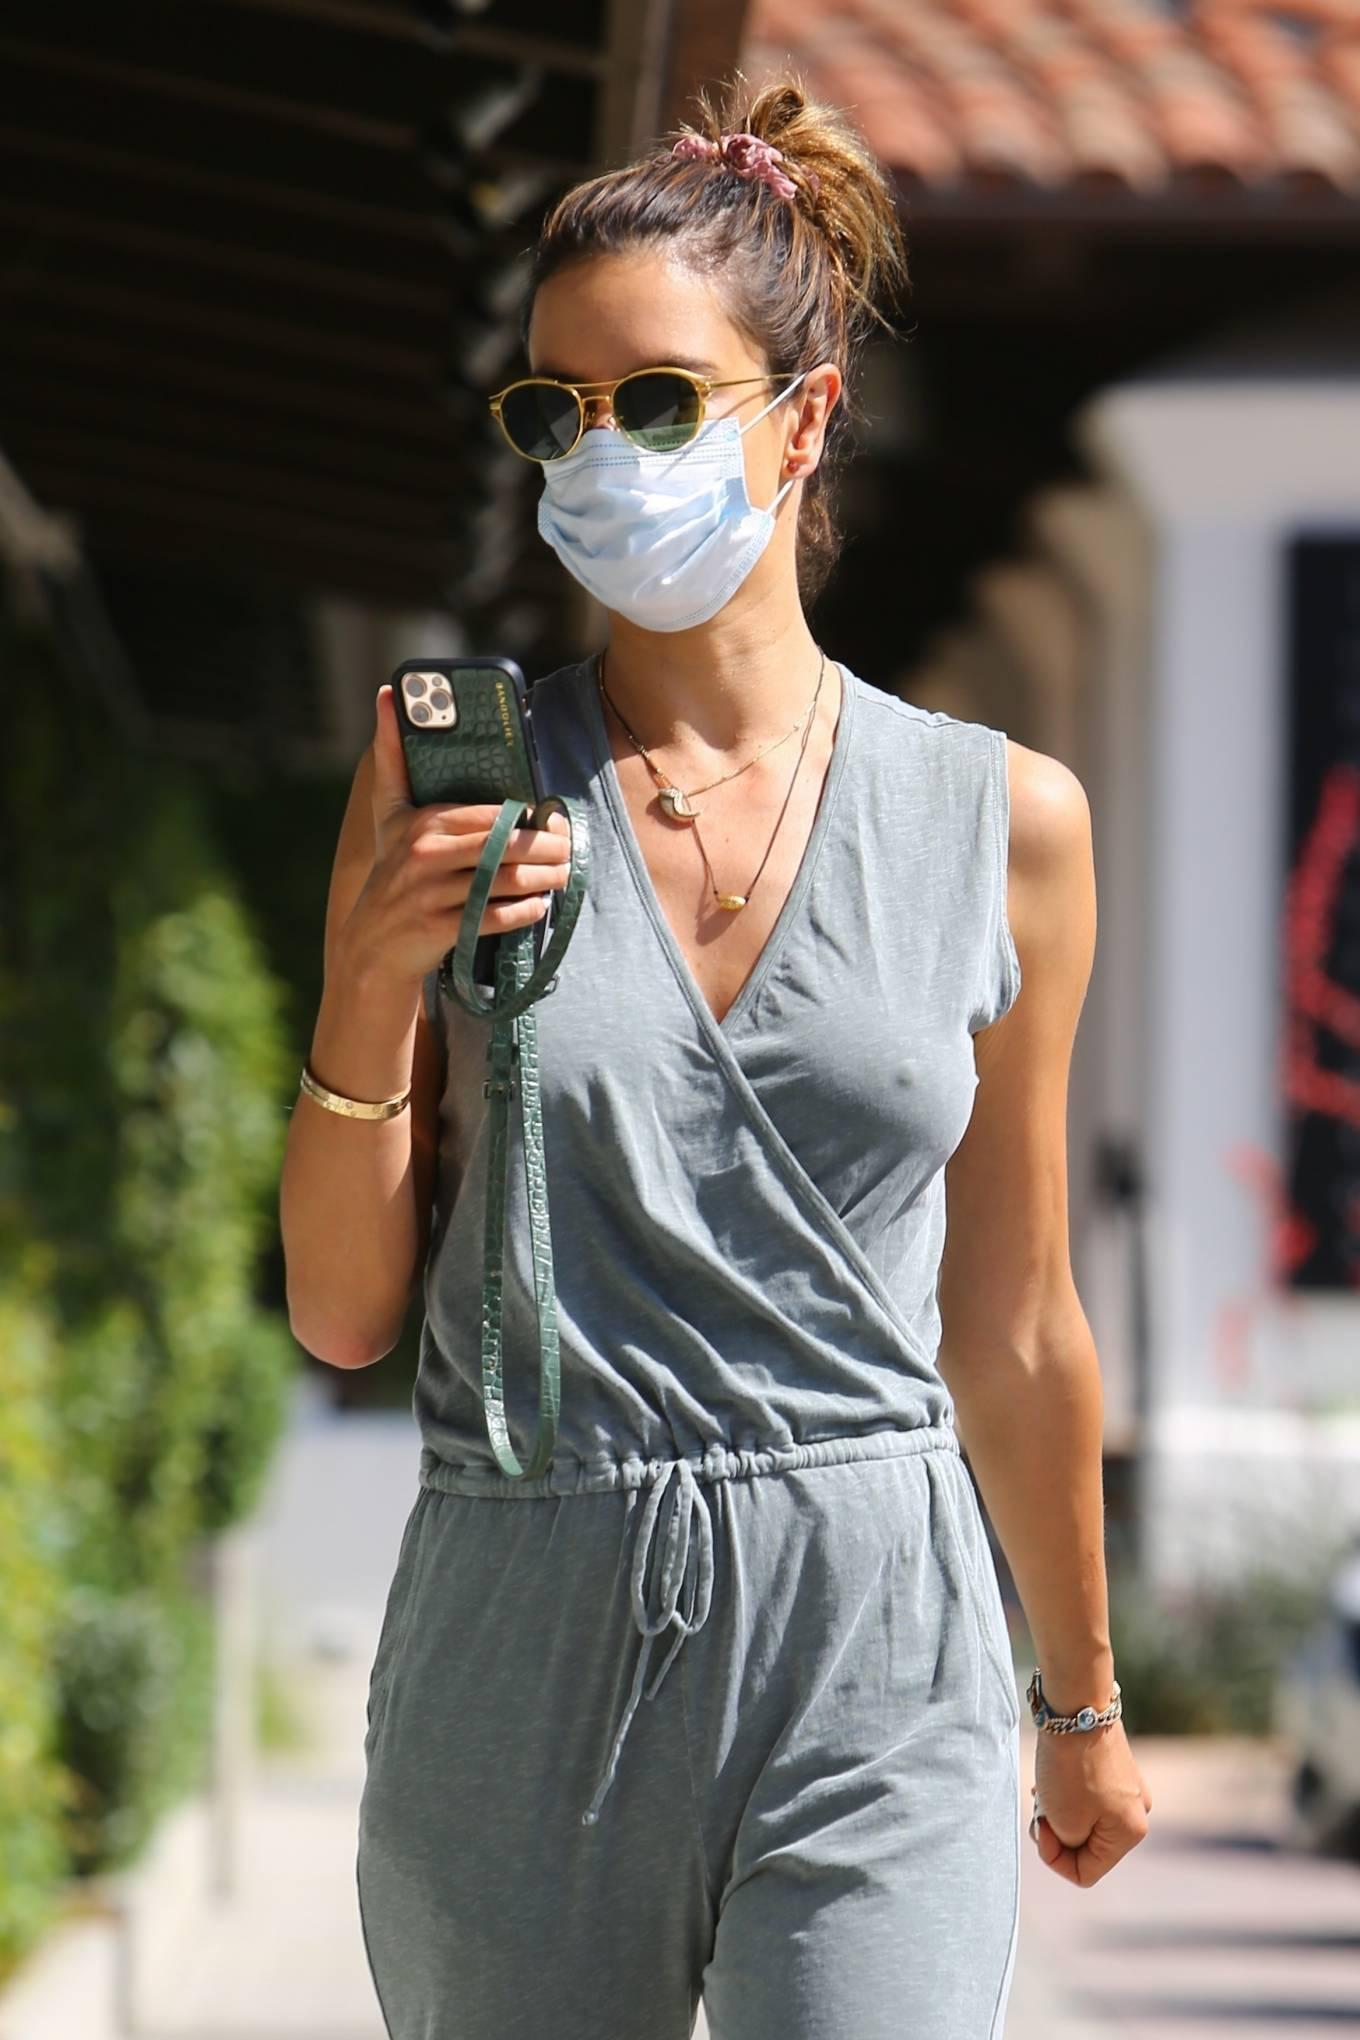 Alessandra Ambrosio - Seen at Sunlife organics in Malibu - California